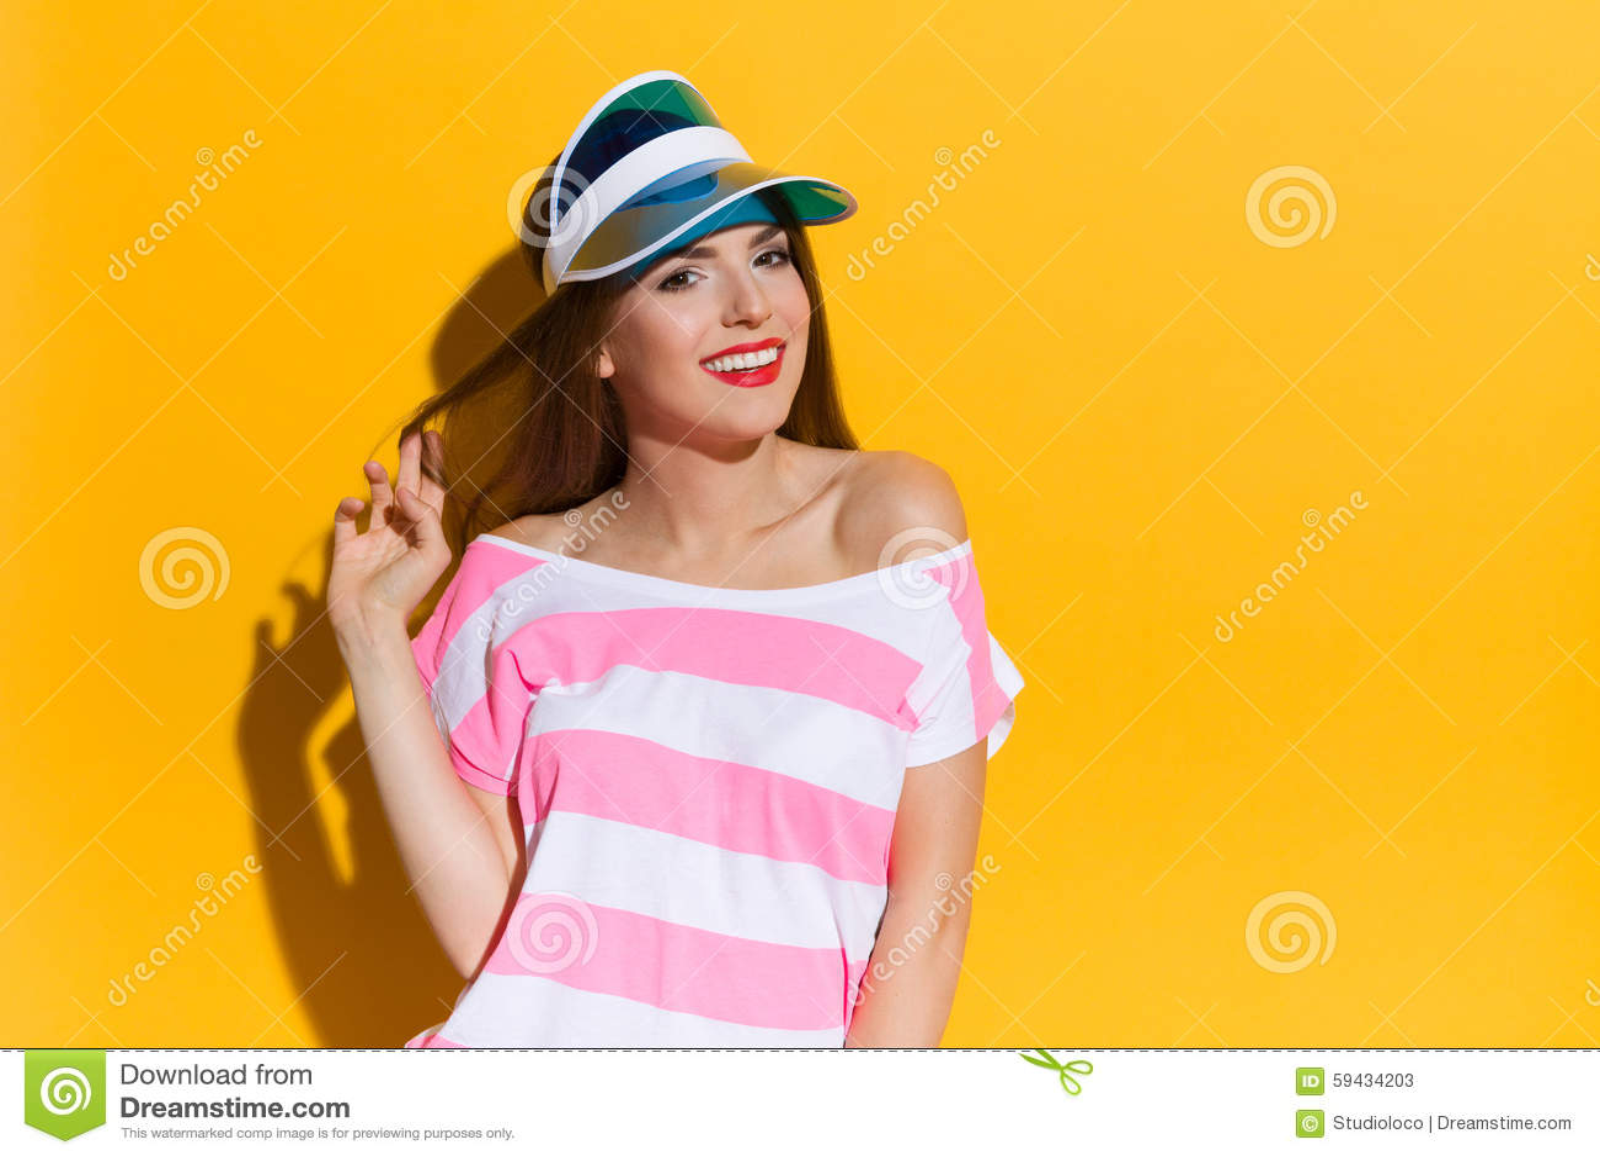 Portrait Of Woman In Transparent Plastic Blue Sun Visor Stock Image ... 43ffd4e44e9